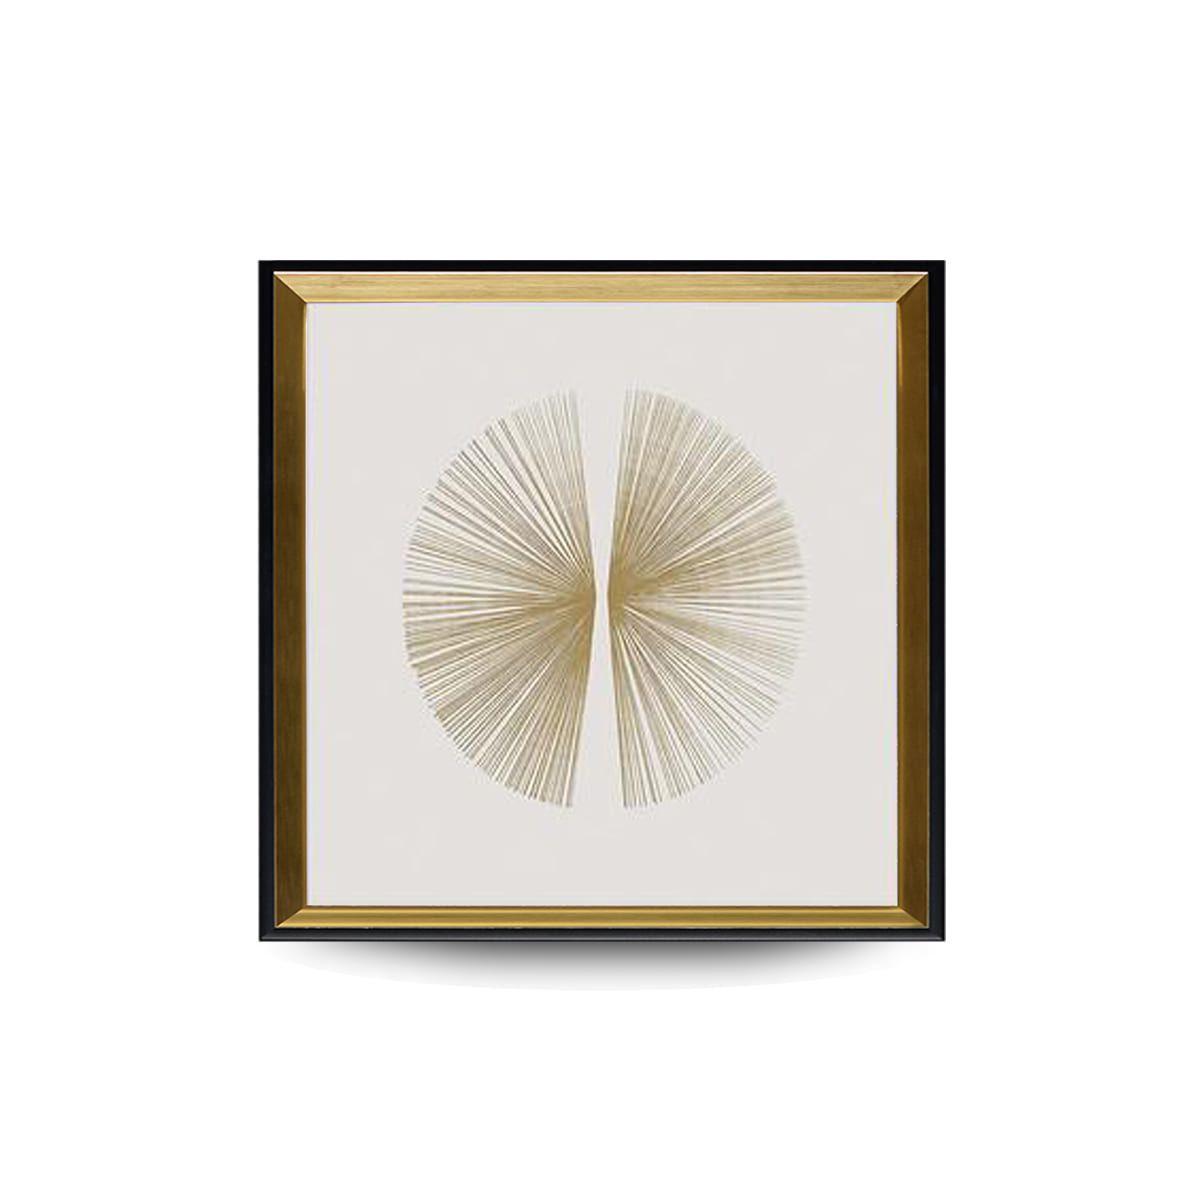 Quadro Decor Círculo Linear Branco